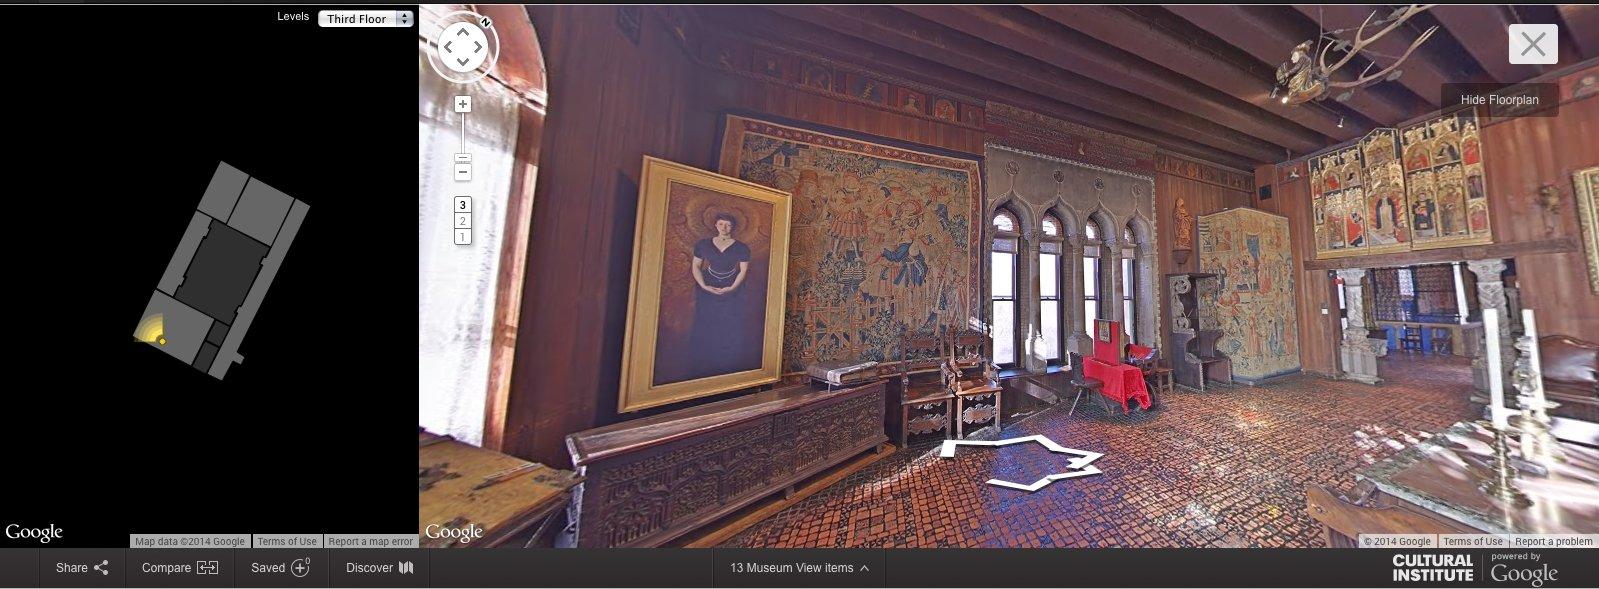 Isabella Gardner Museum, em Boston. (Foto: Reprodução/Google)